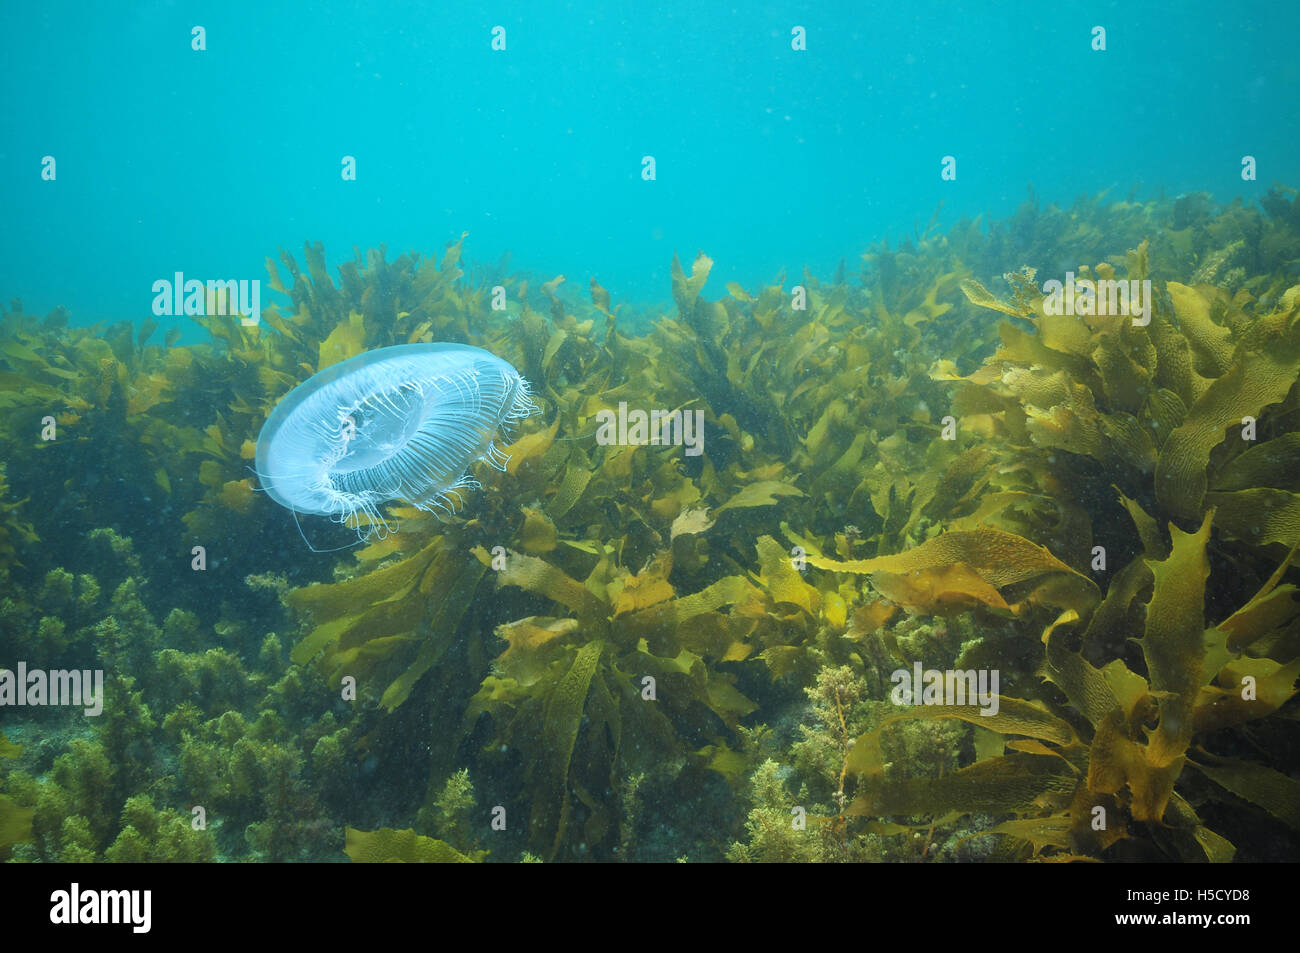 Jellyfish hovering among kelp - Stock Image